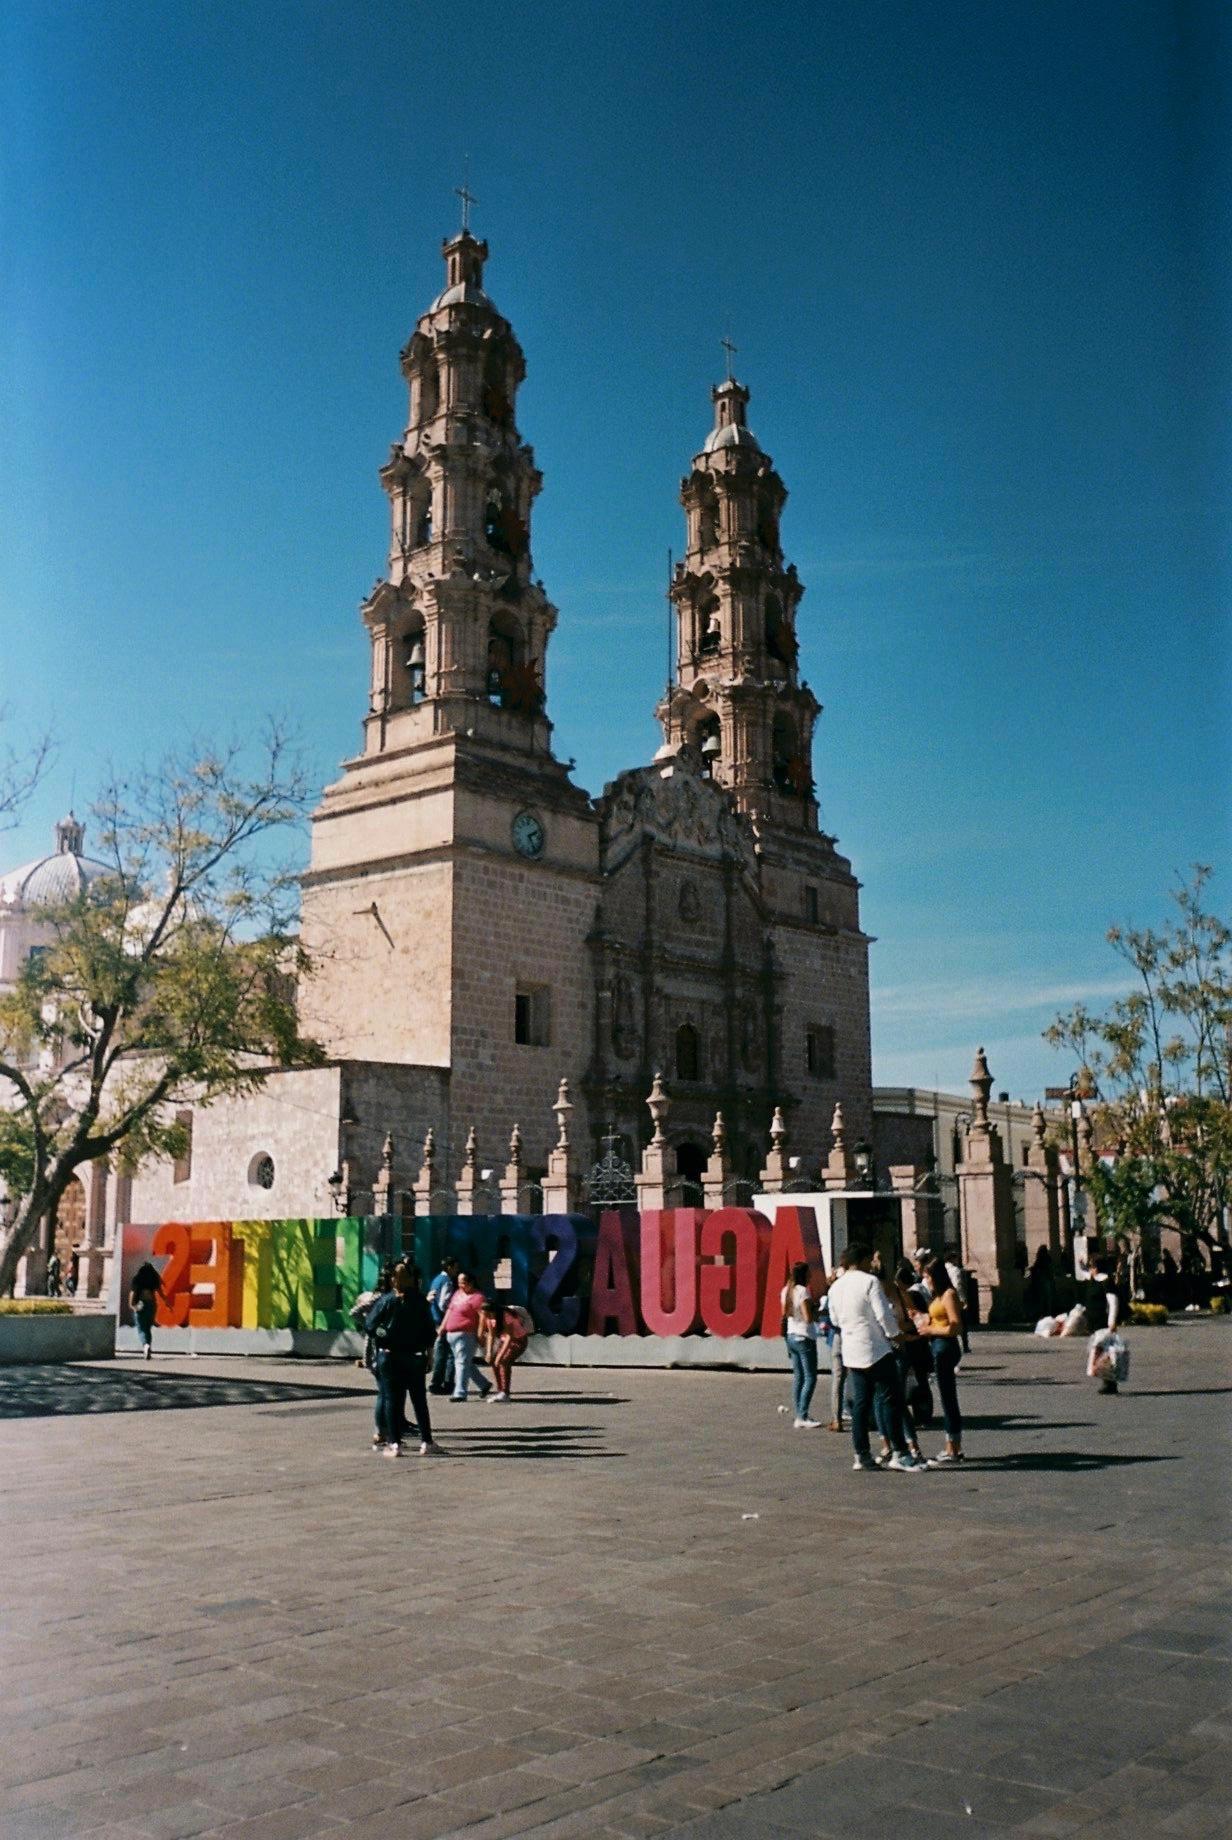 Aguascalientes 01-2020 - 13 of 24